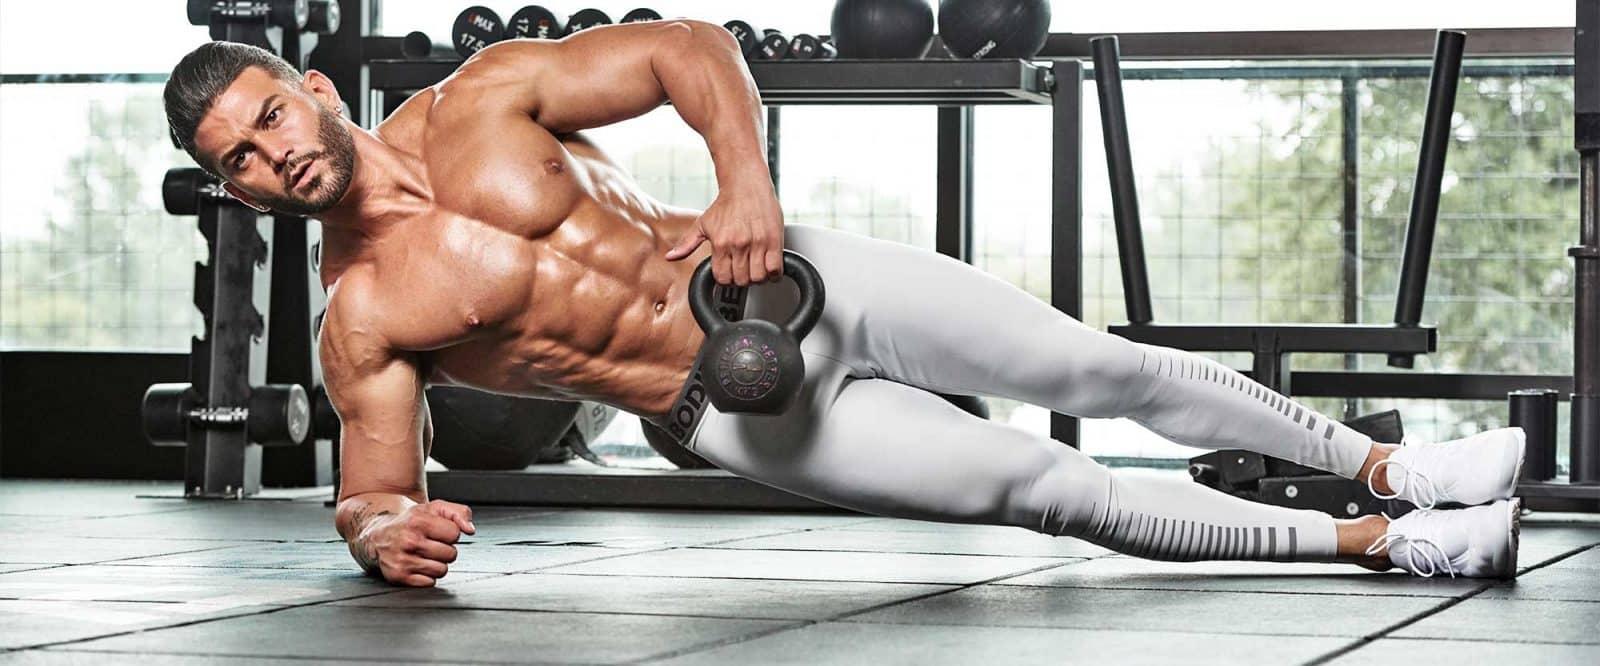 Better Bodies Gym Bottoms